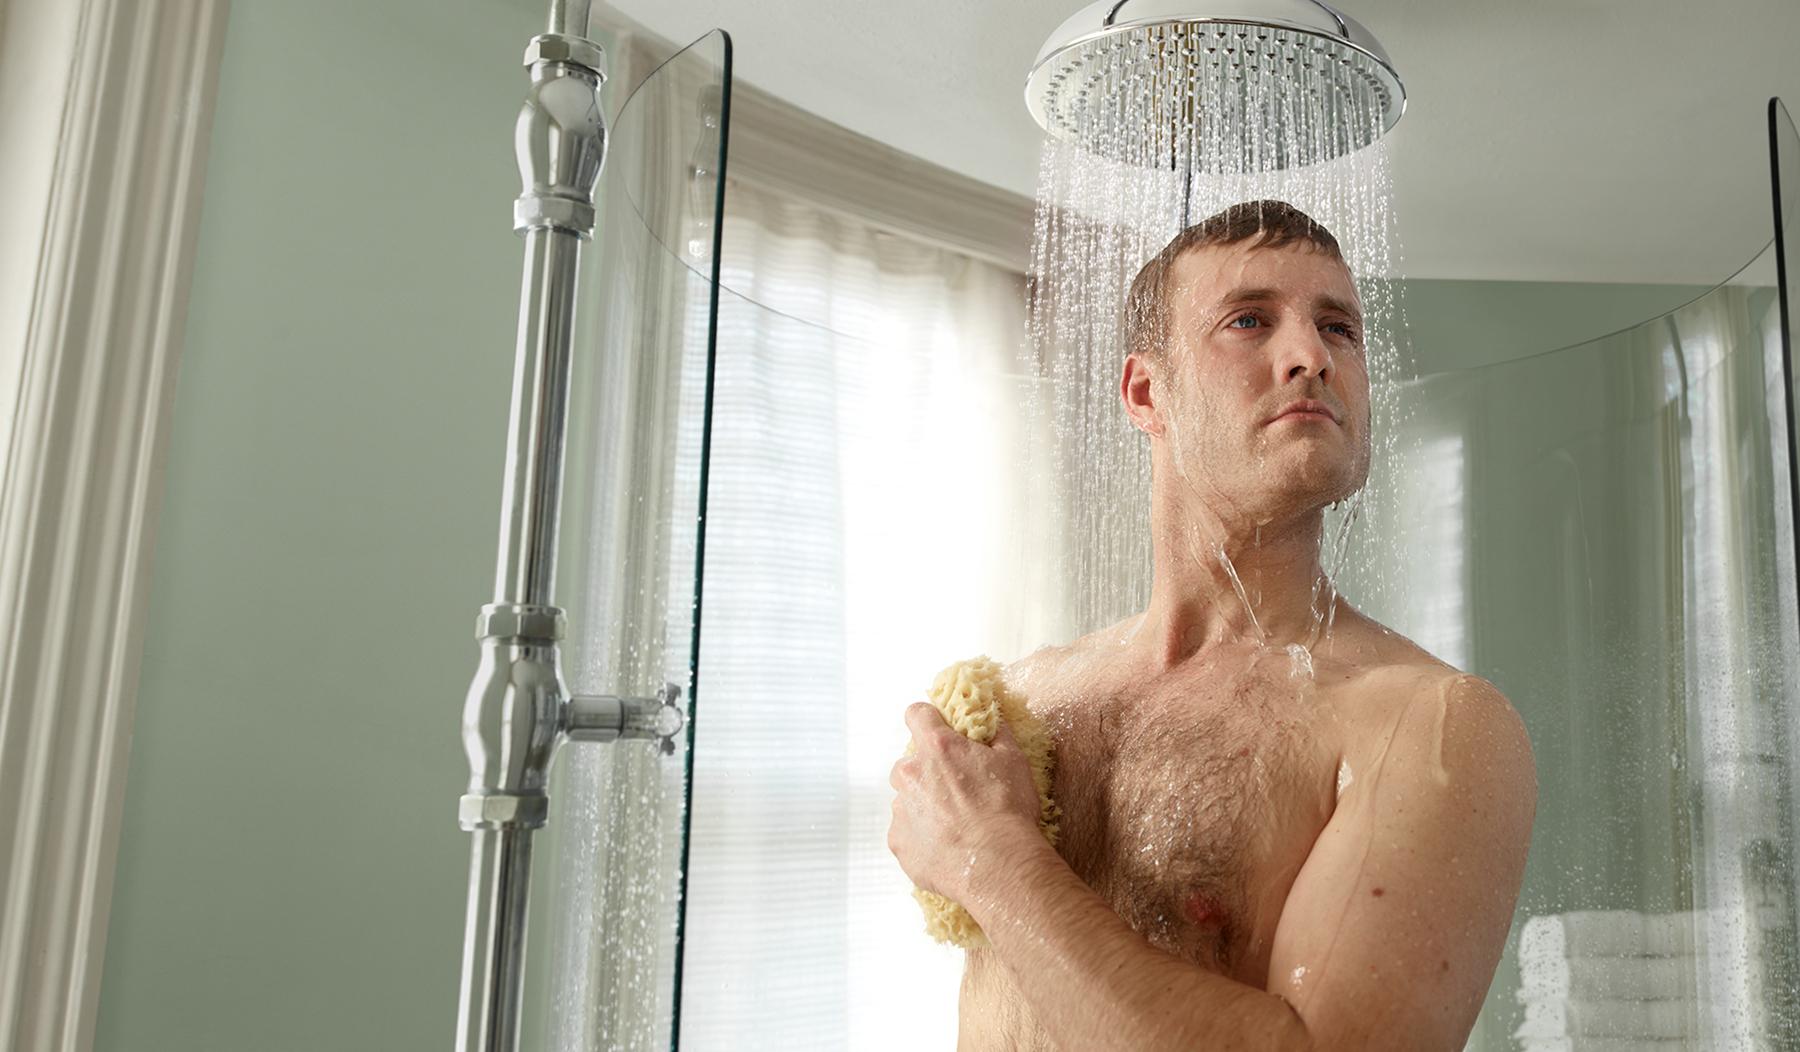 0680_LastMinute_Shower_R4 simp